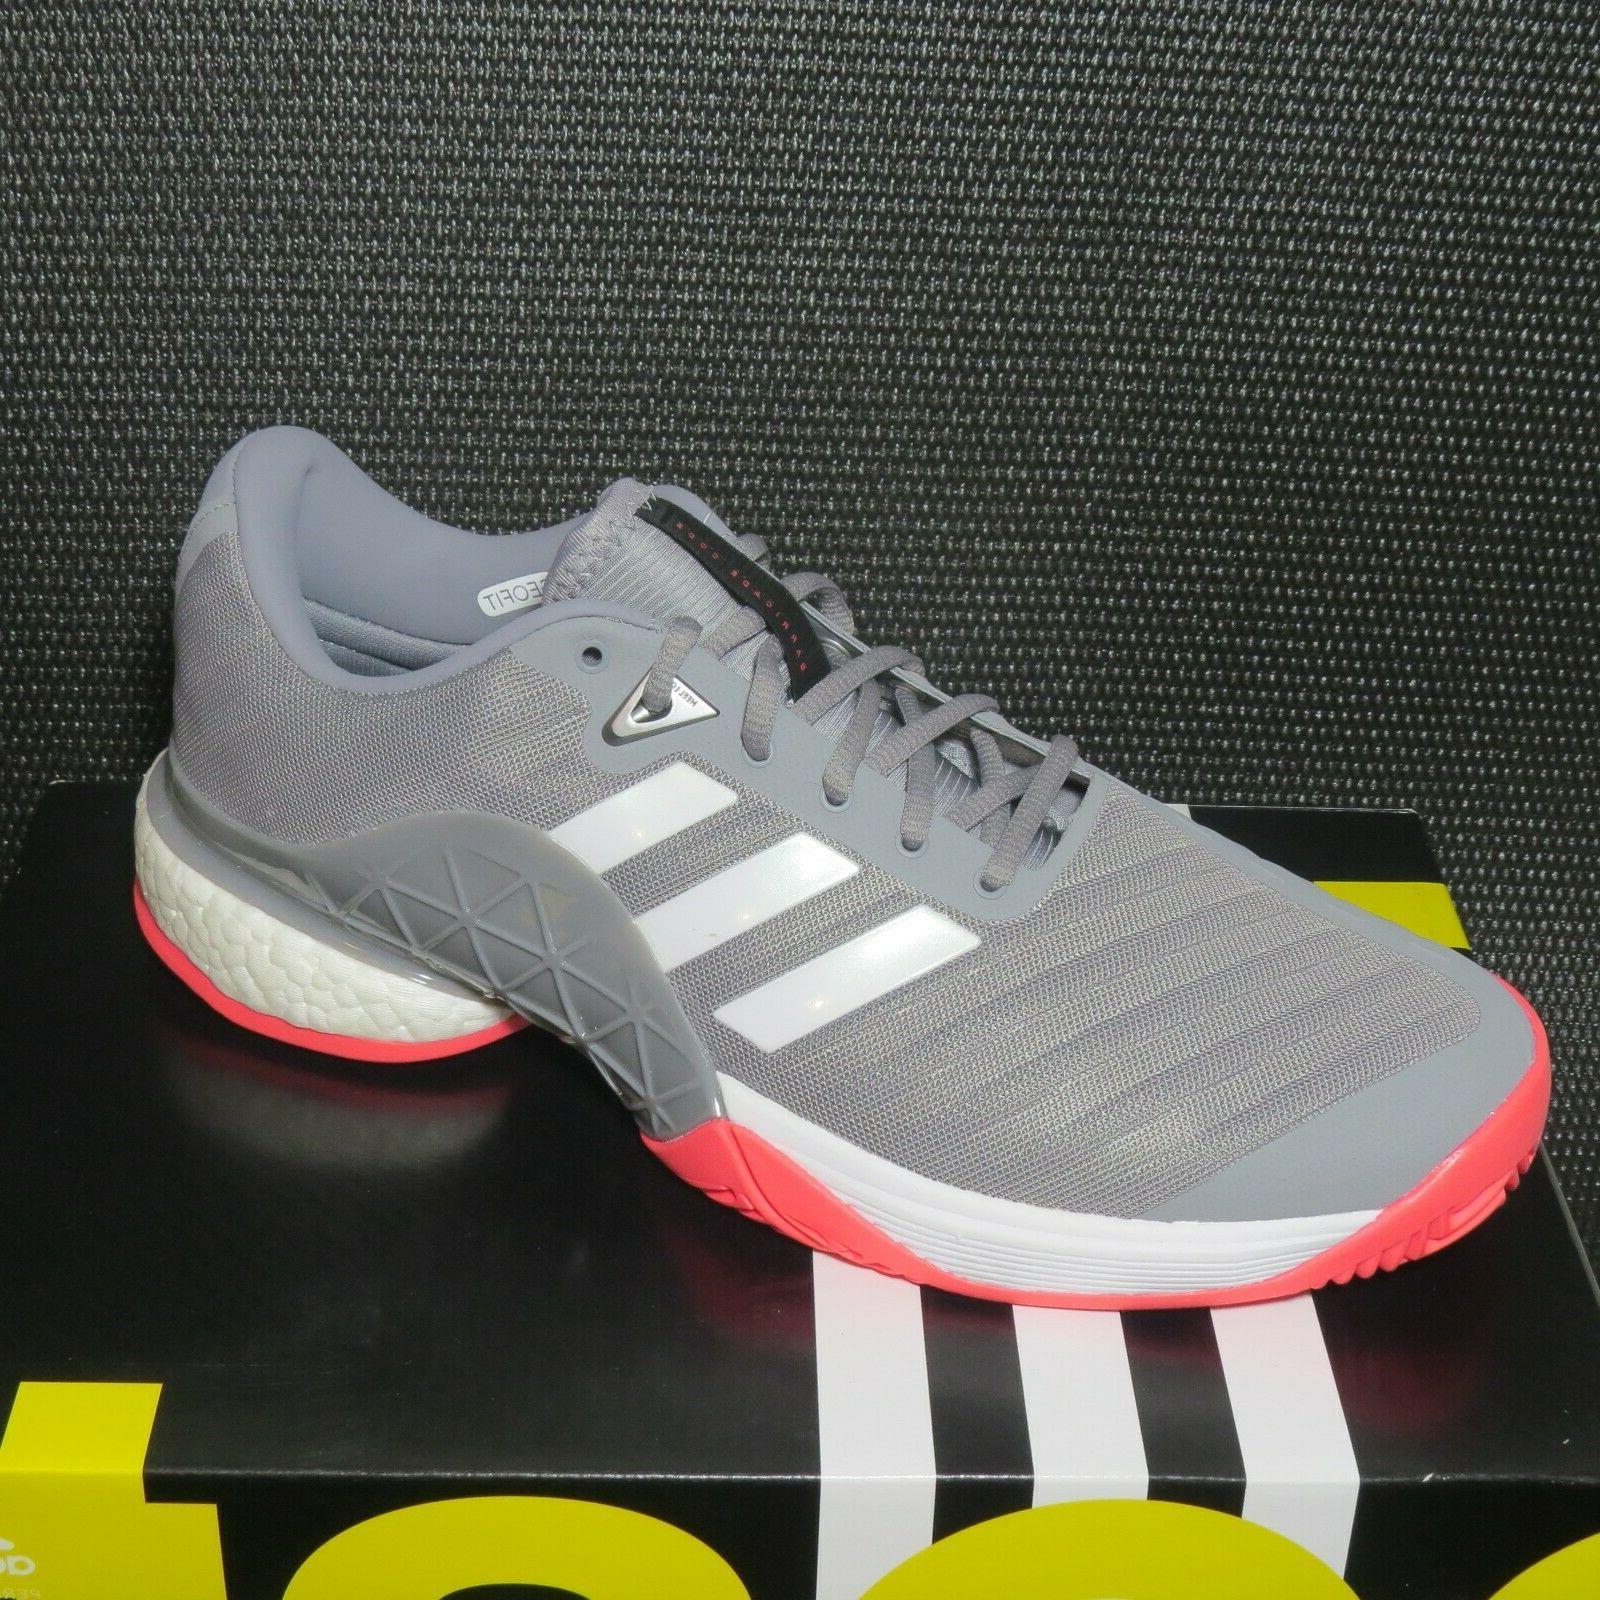 adidas 2018 AH2094 Size Tennis Shoes Grey/White/Pink NIB